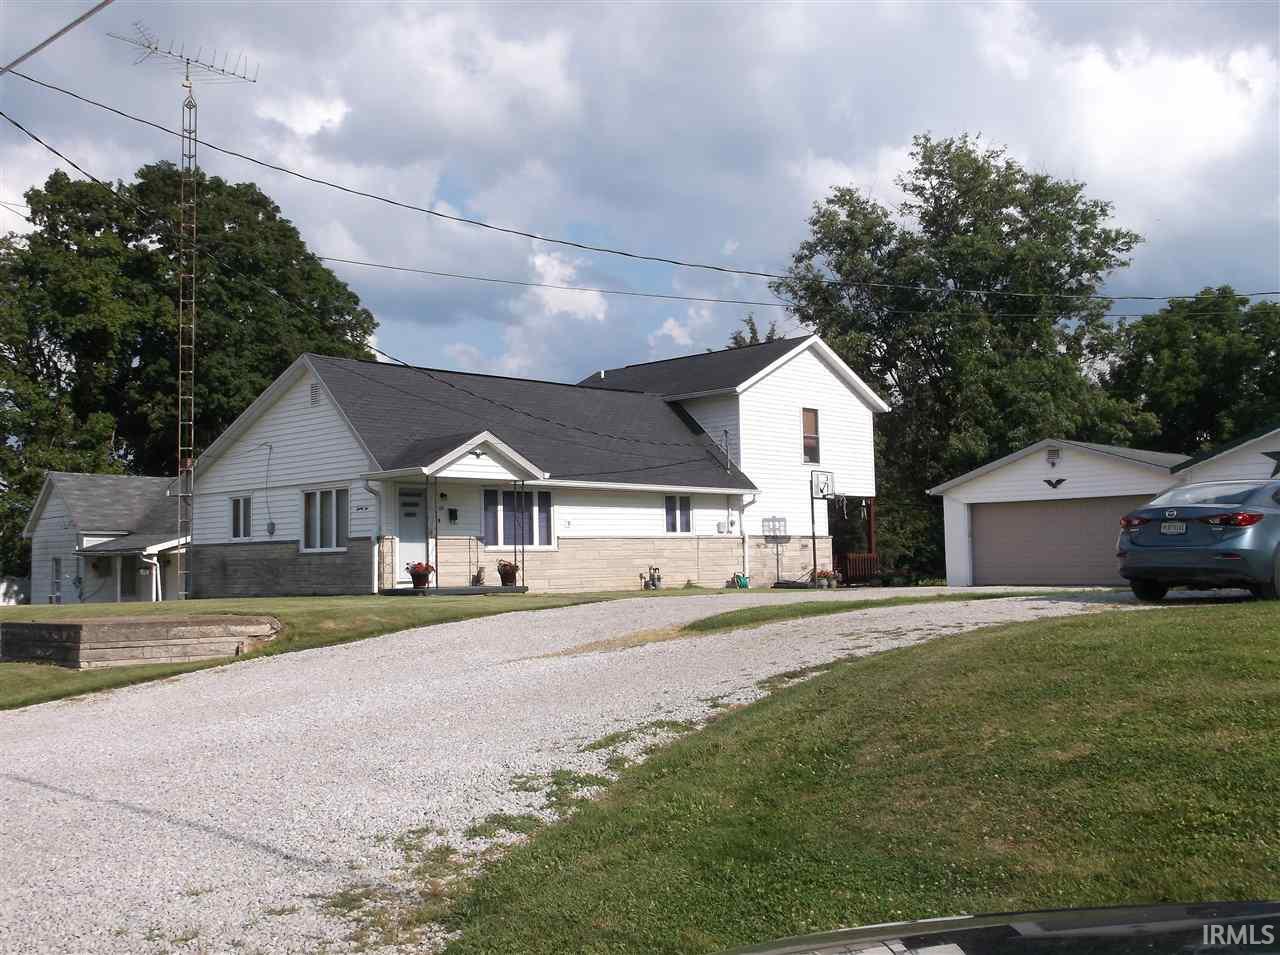 22 E Judson, Bloomfield, IN 47424